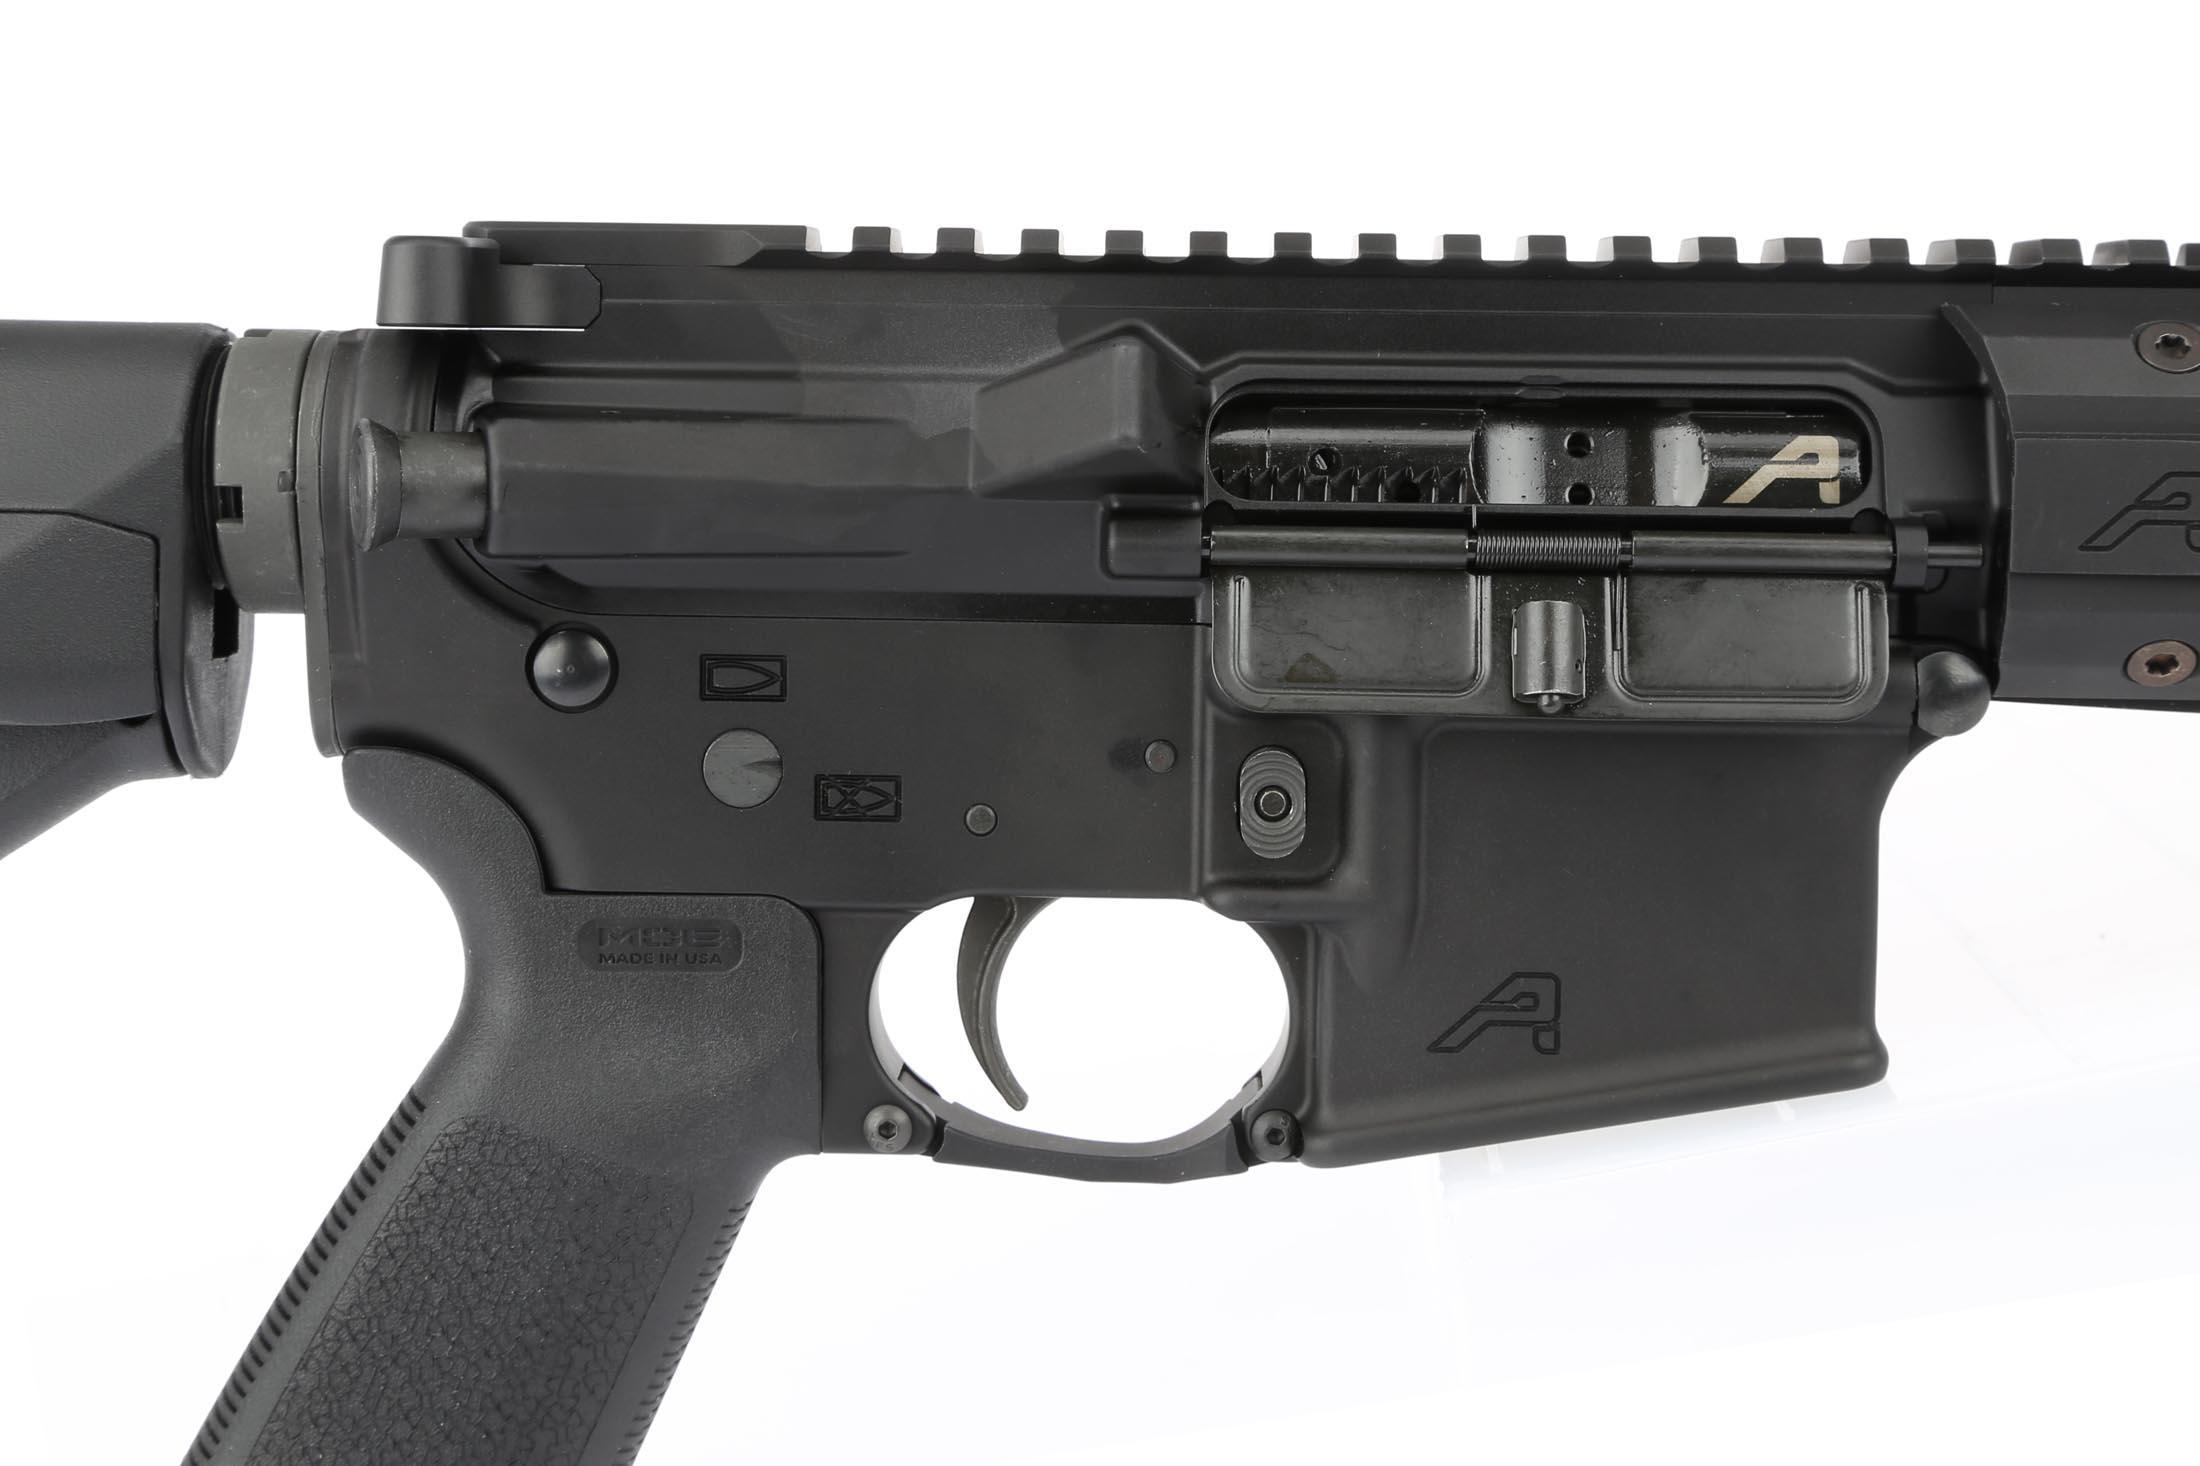 Aero Precision 16 Quot 5 56 Nato 1 7 Mid Length M4e1 Rifle